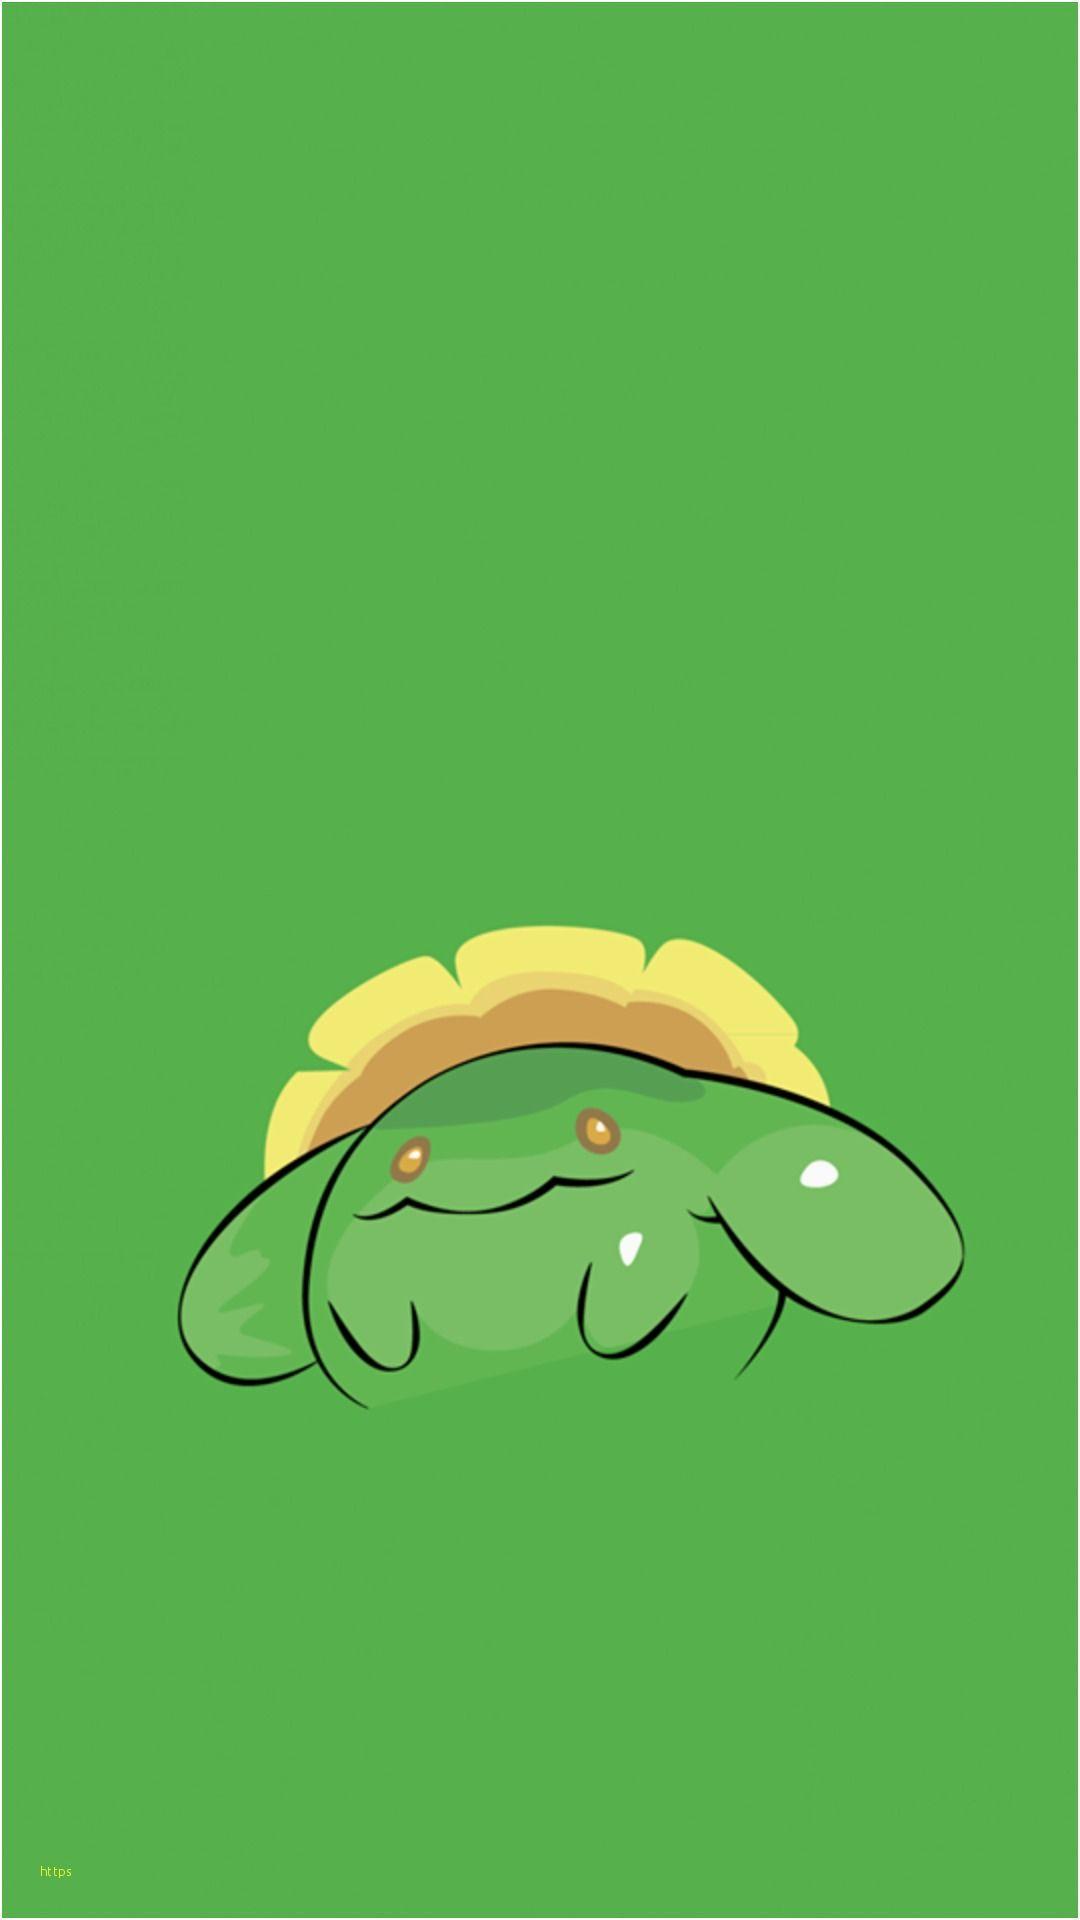 Pokemon Minimalist mobile wallpaper